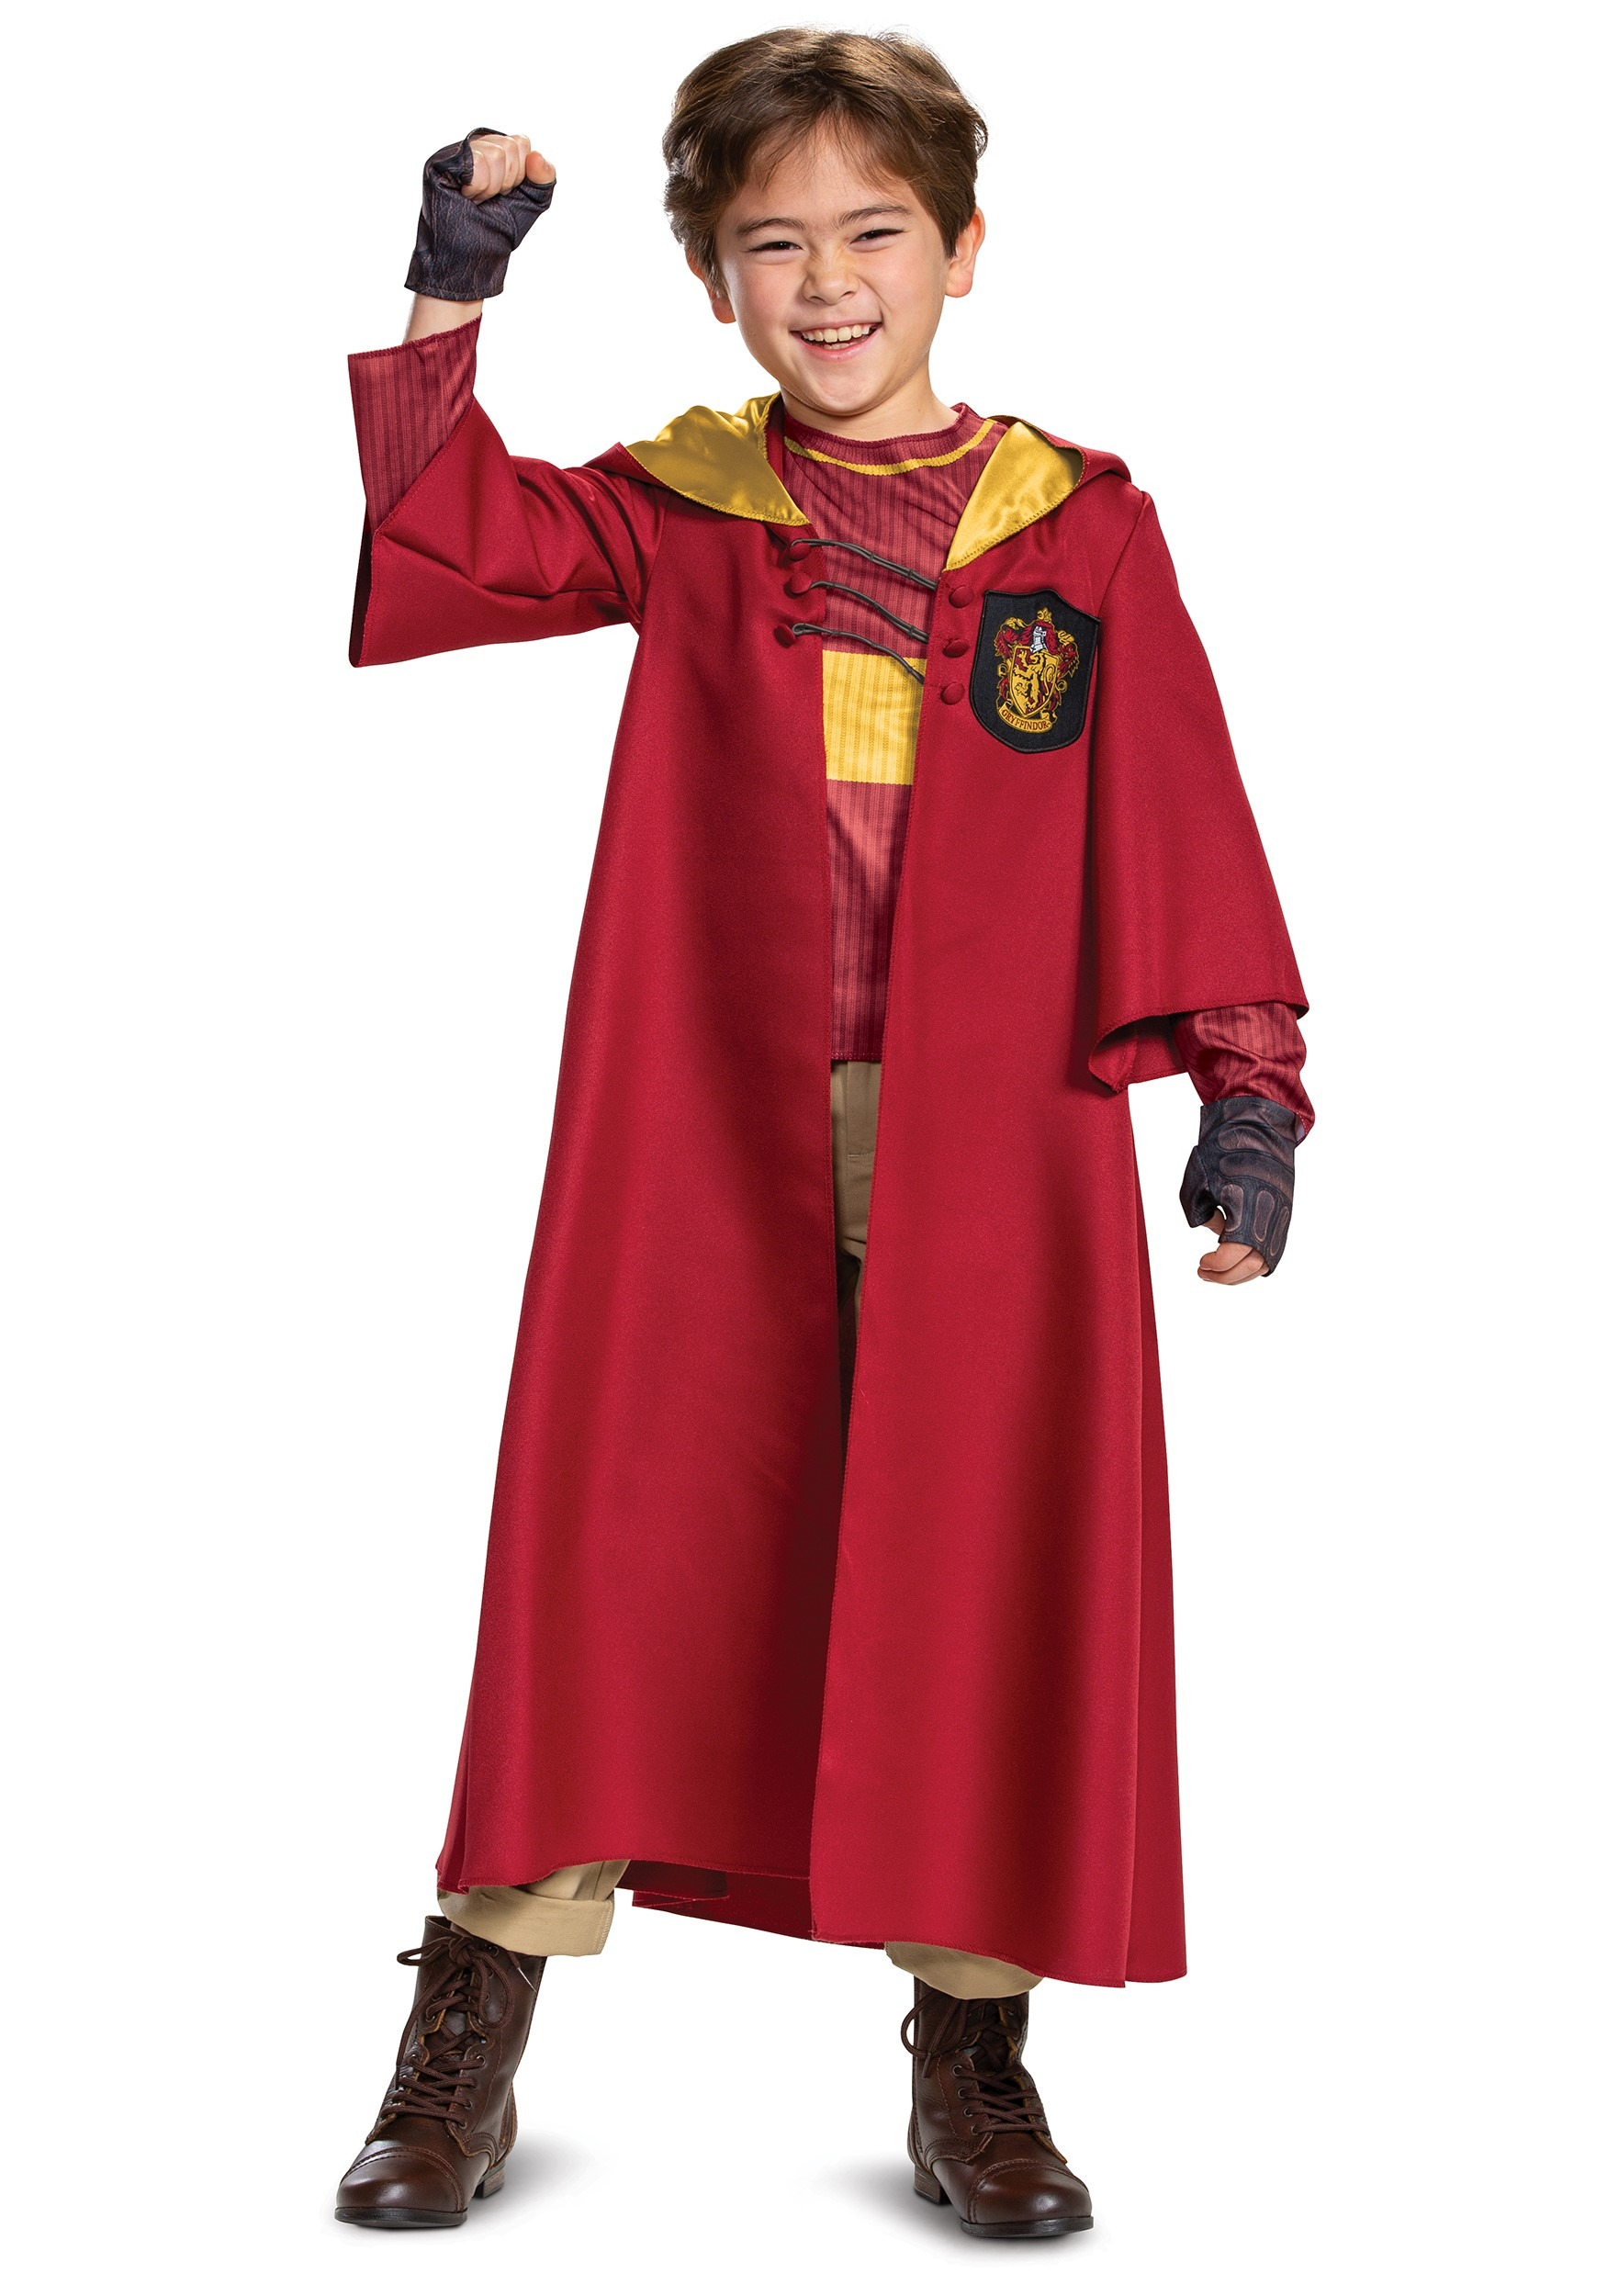 Harry Potter Deluxe Kid S Gryffindor Quidditch Robe Costume Fandom Shop